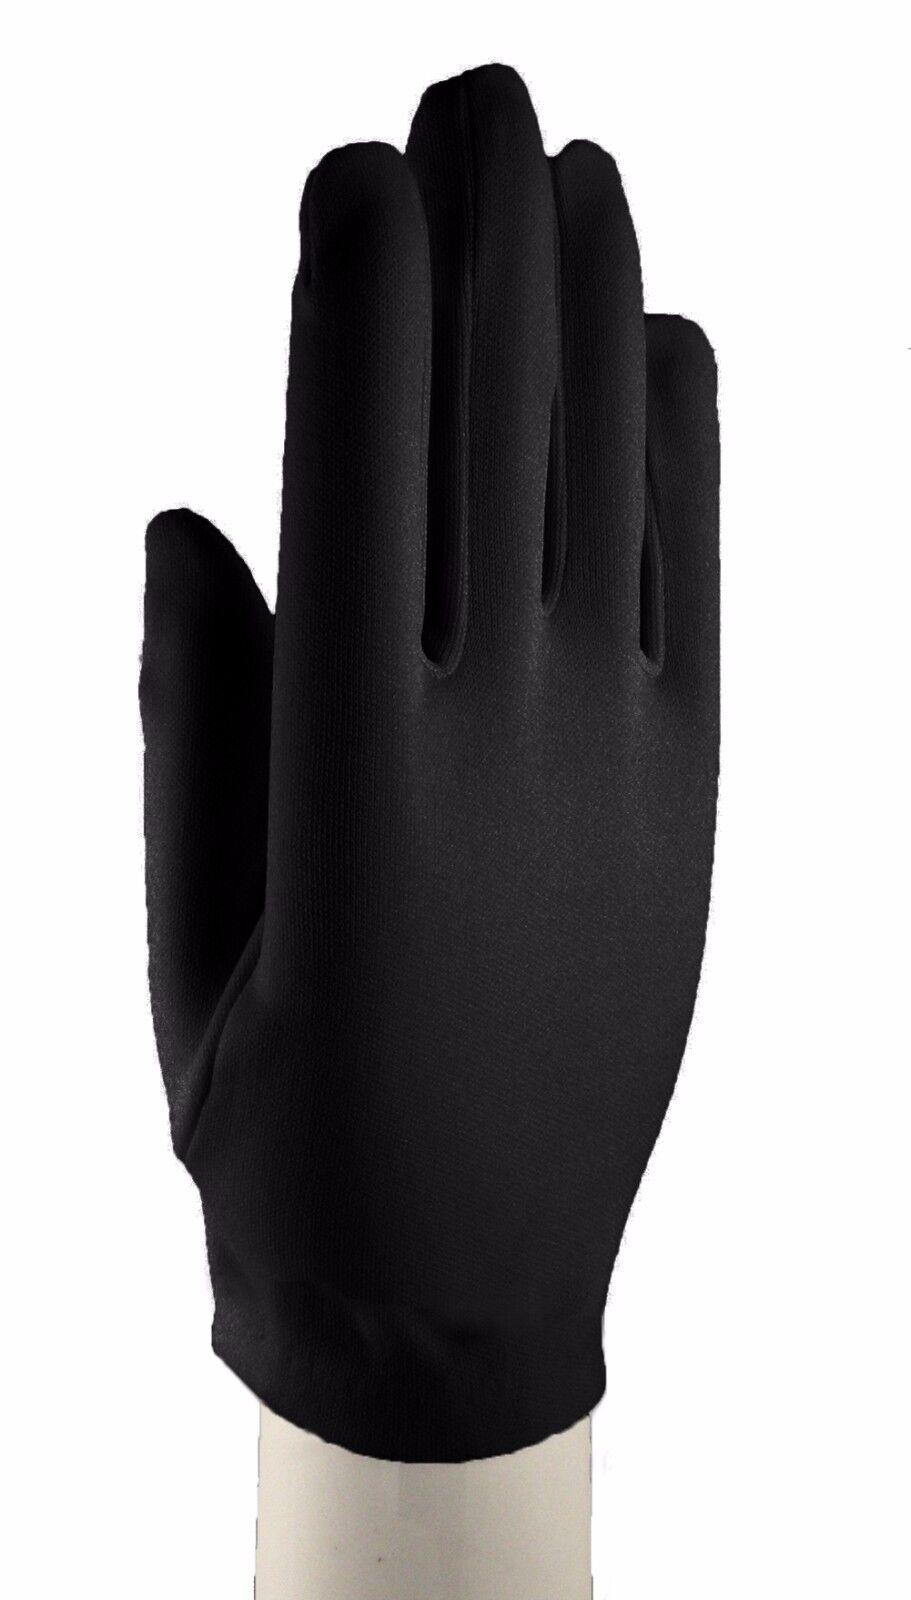 Black dress up gloves -  Black Wrist Length Dress Gloves Dress Up Church Formal